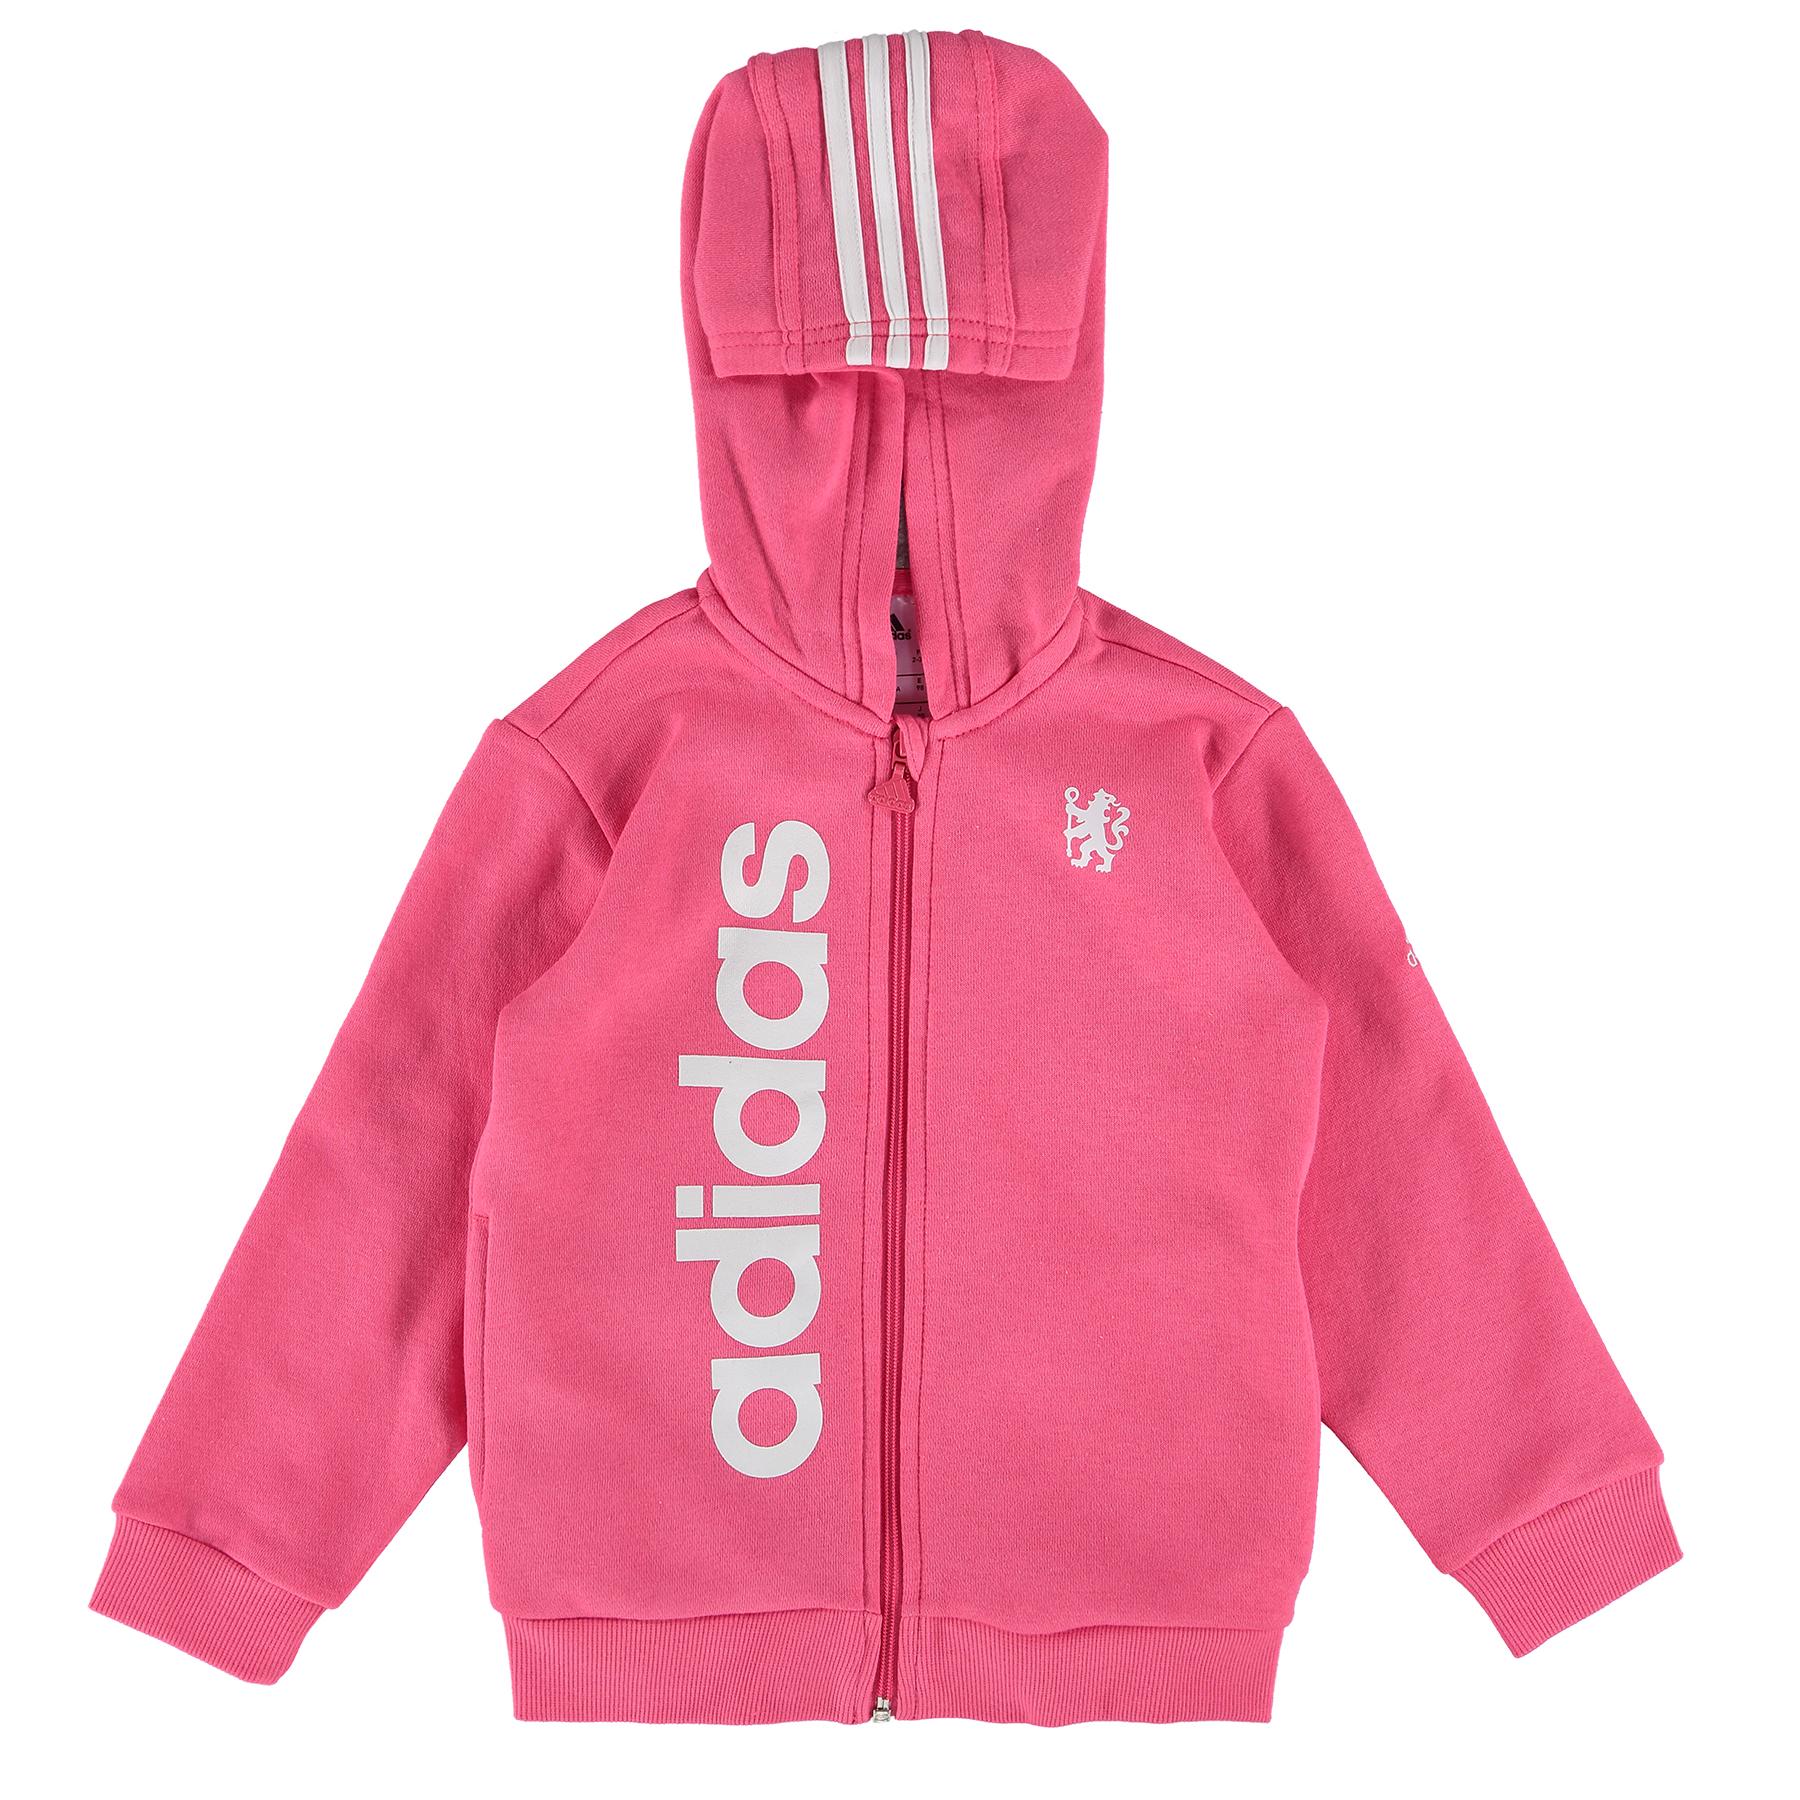 Chelsea Full Zip Hooded Baby Jogsuit - Girls - Pink-Grey